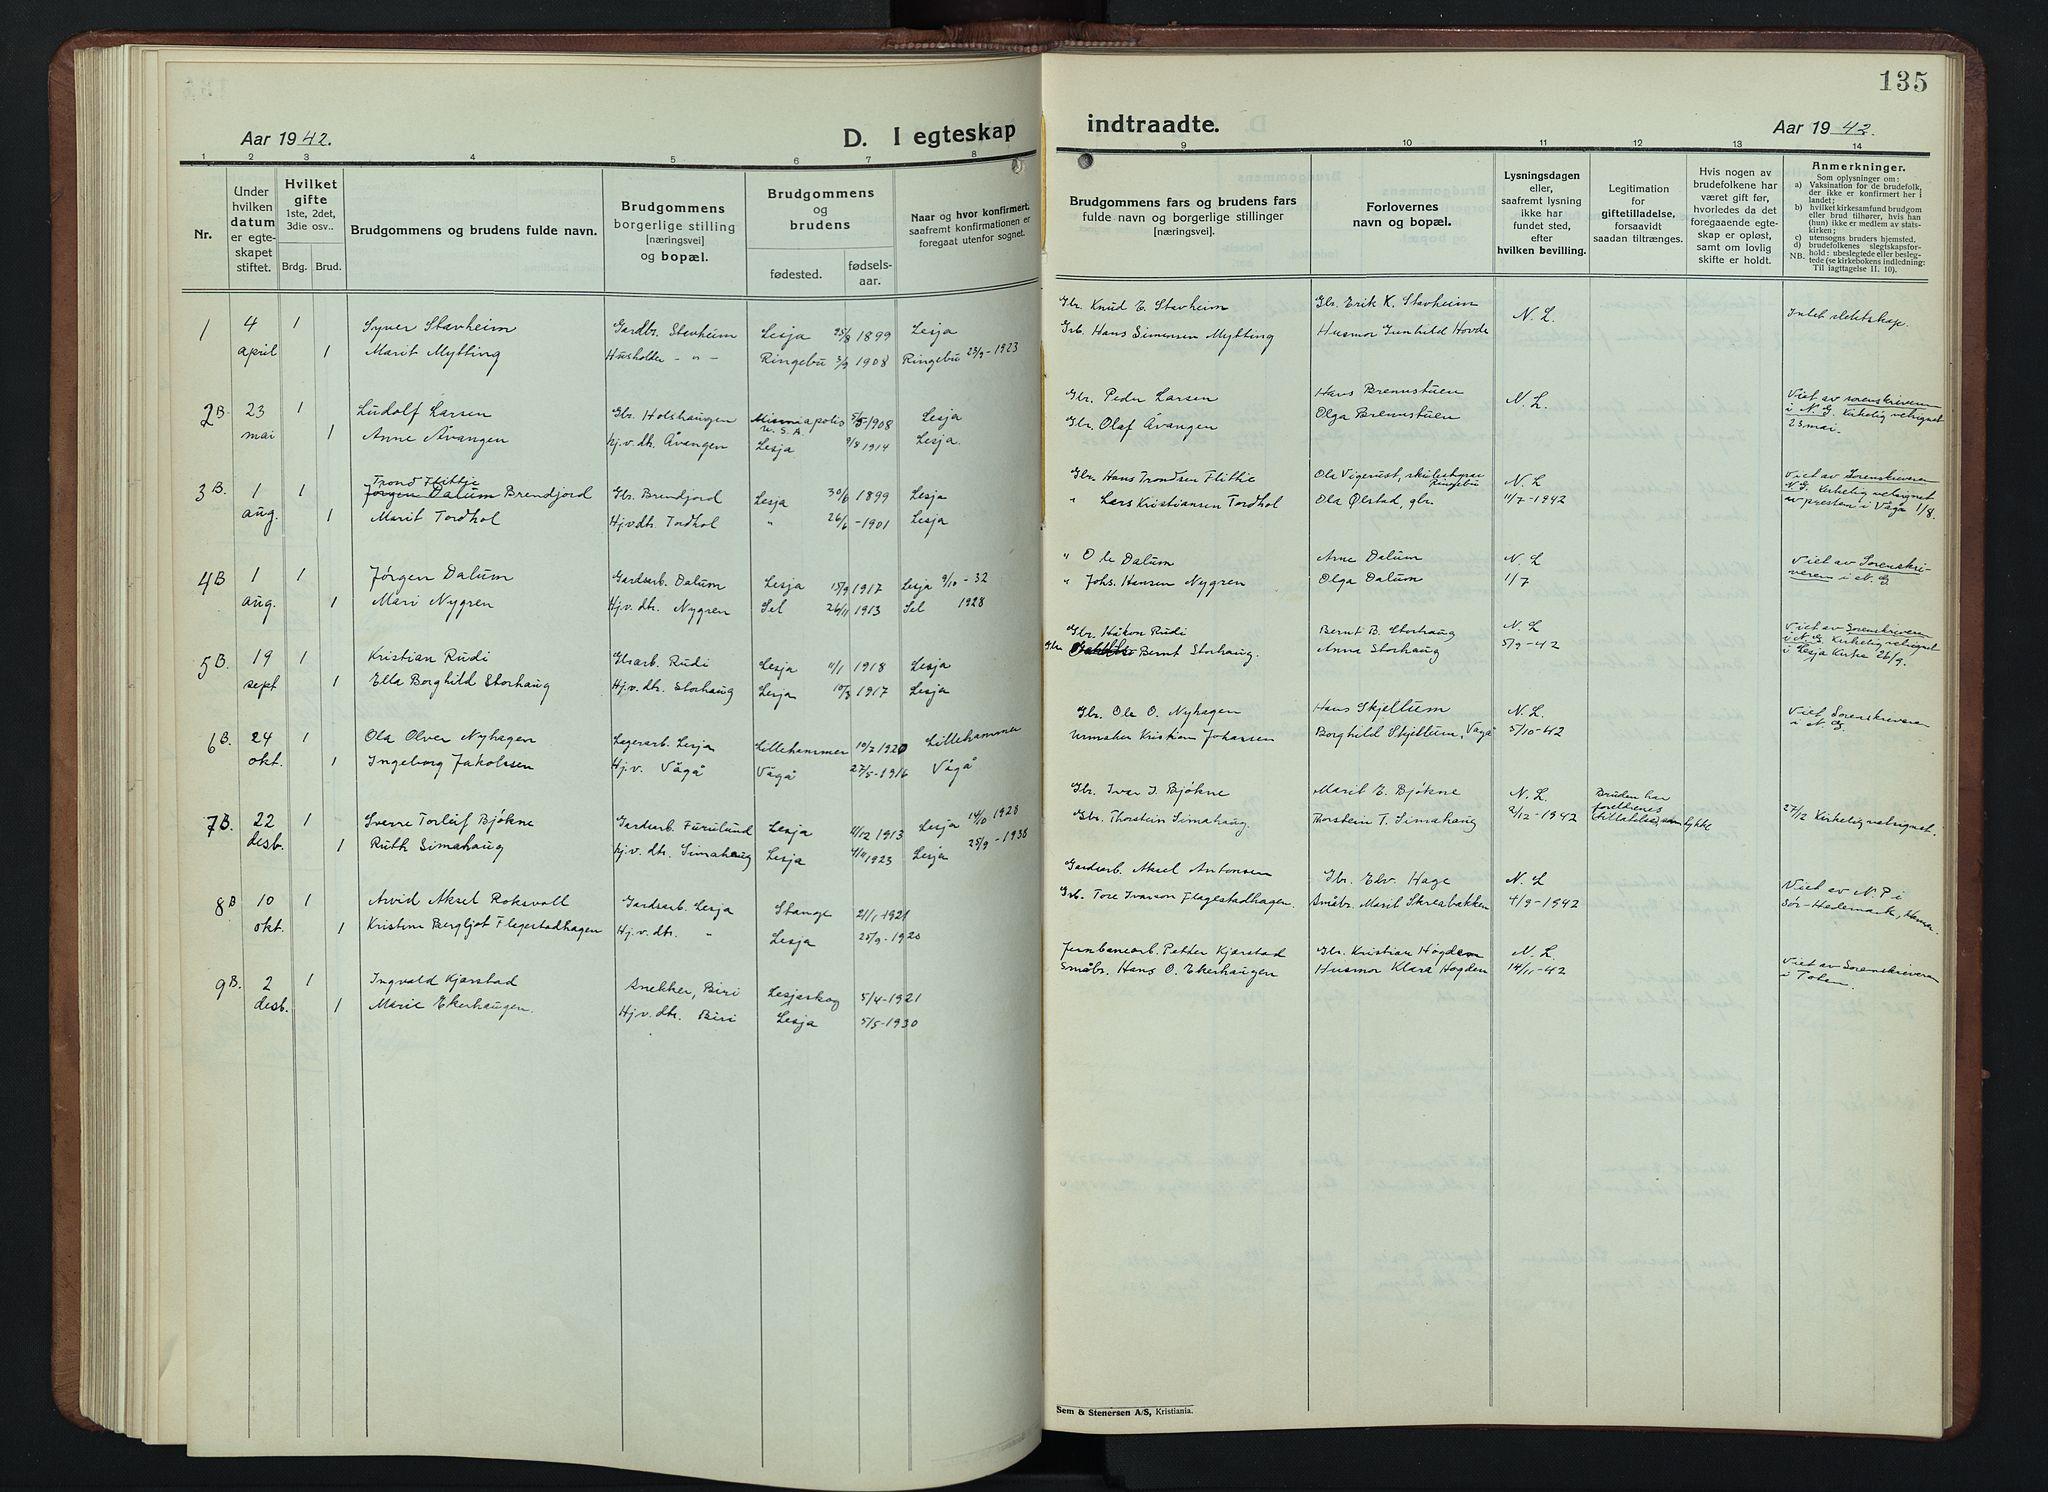 SAH, Lesja prestekontor, Klokkerbok nr. 9, 1924-1947, s. 135